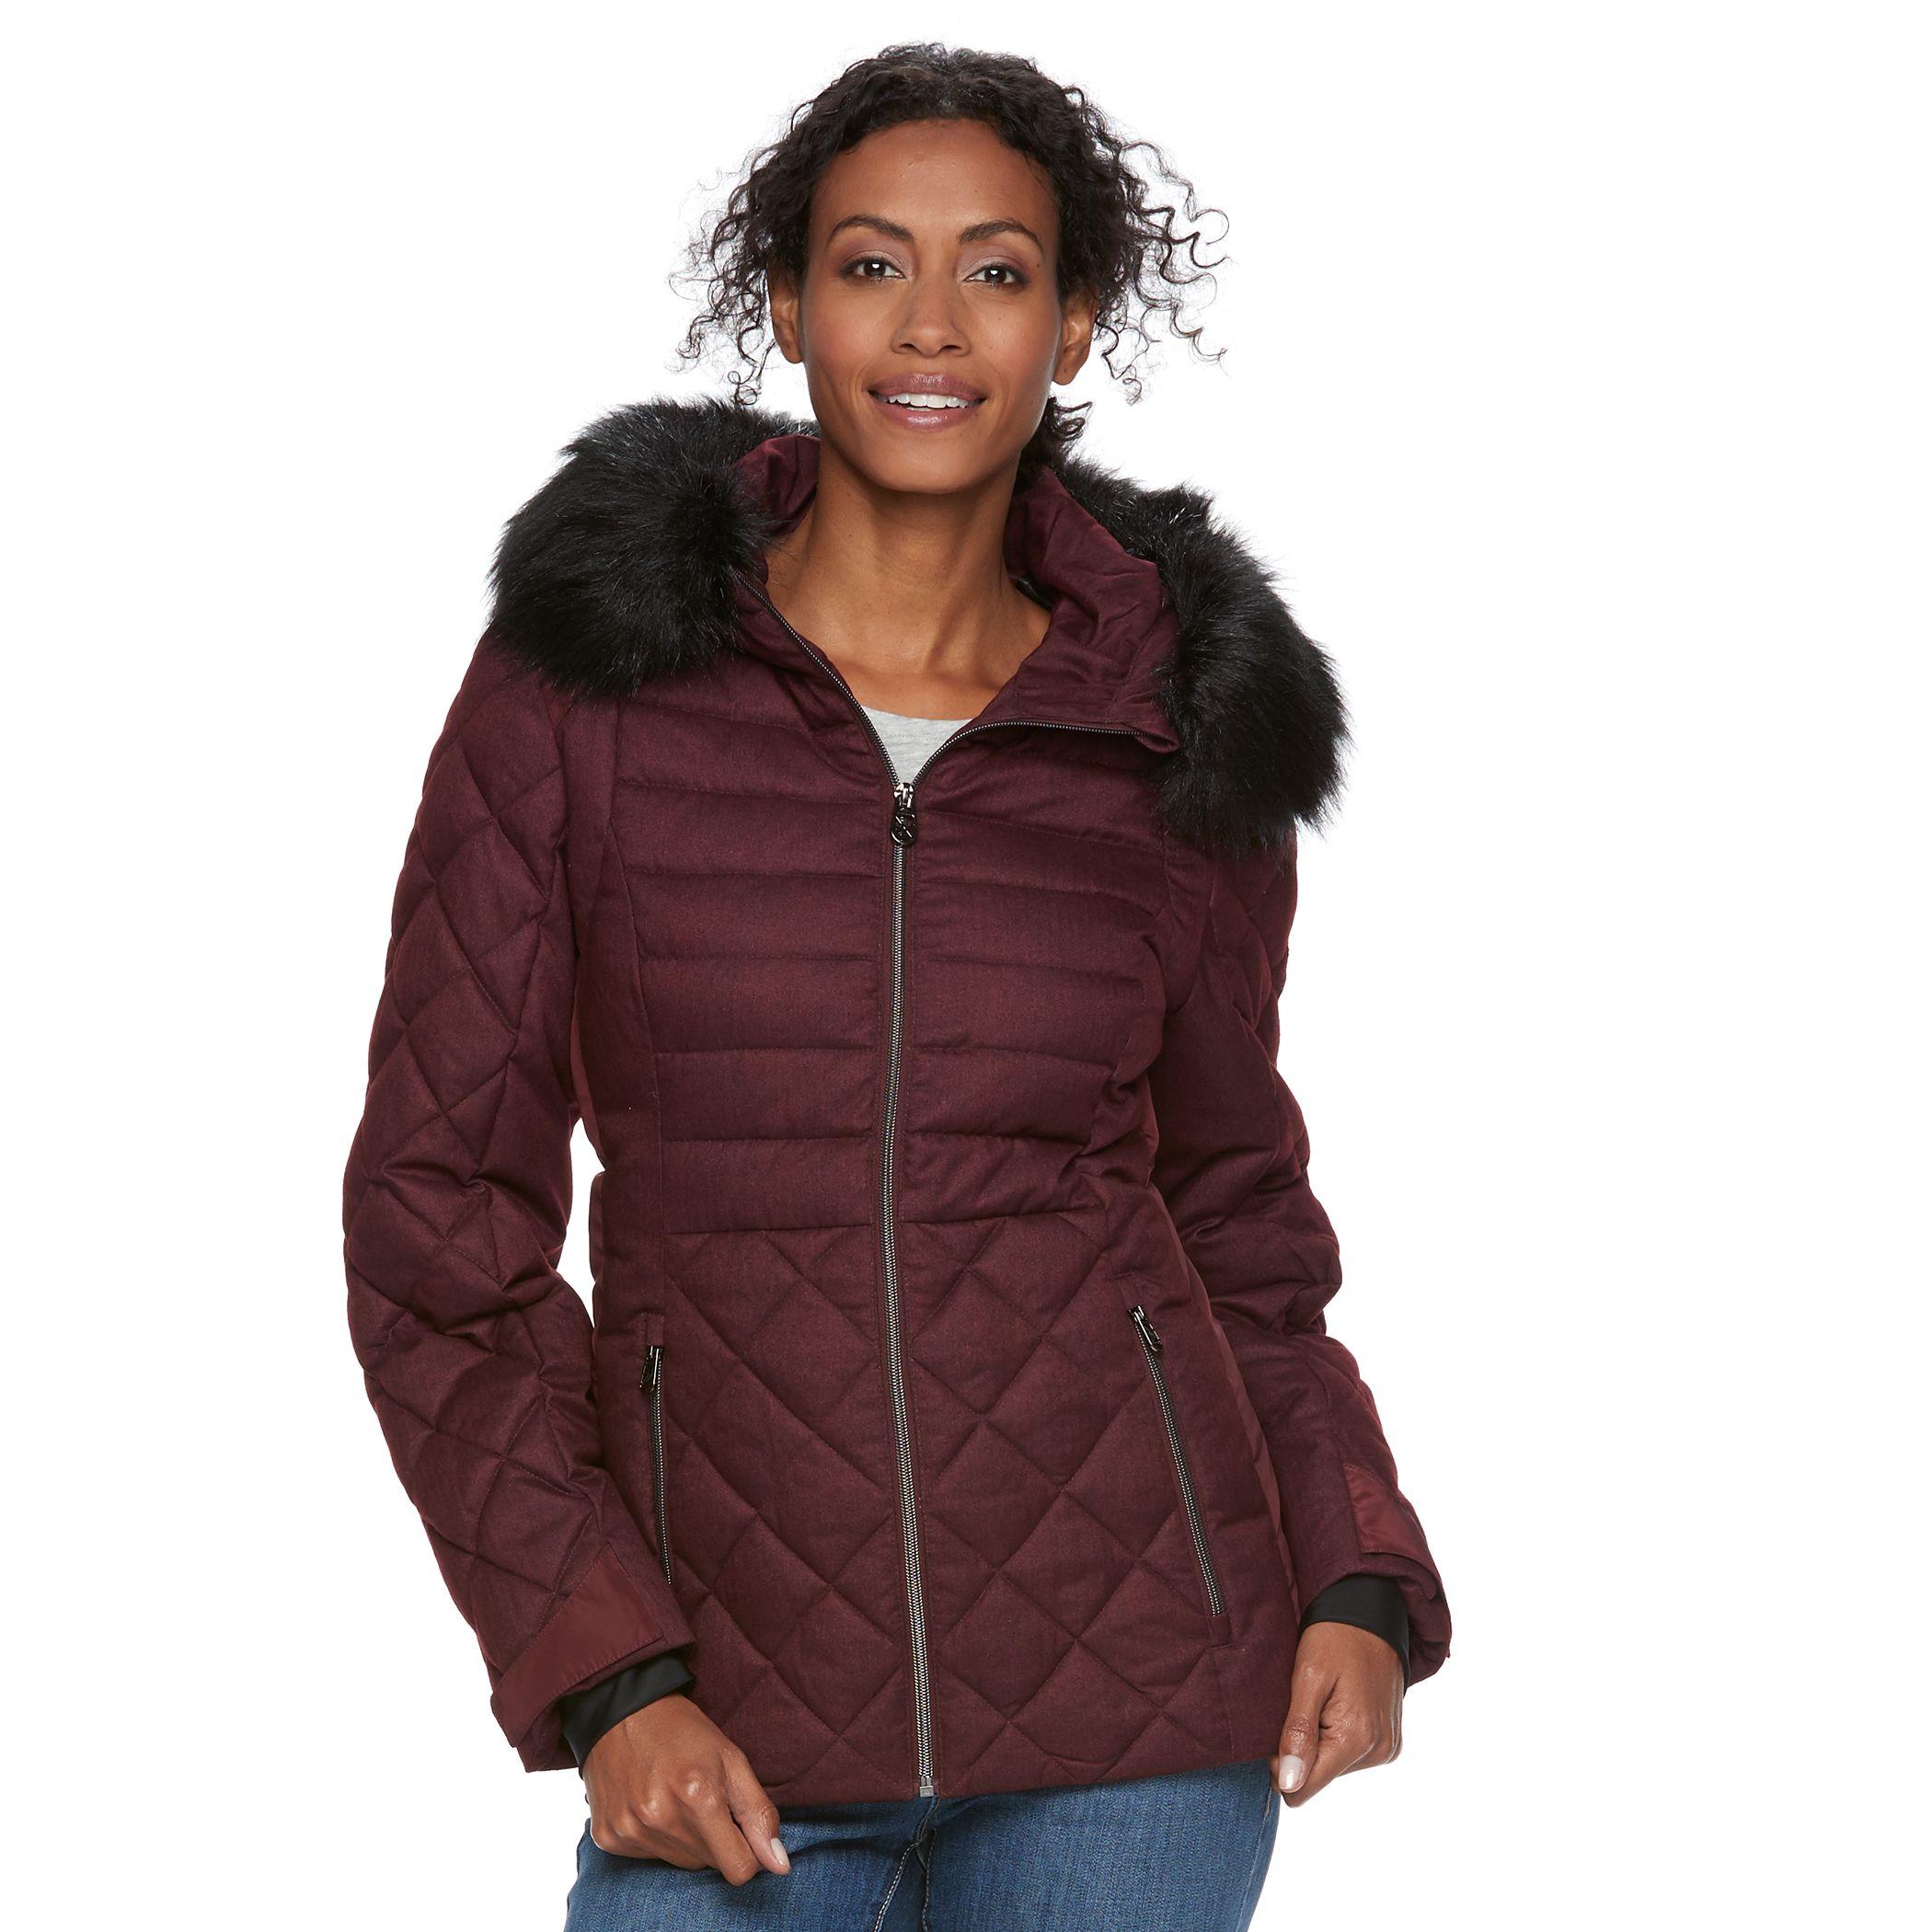 Converse padded jacket women's